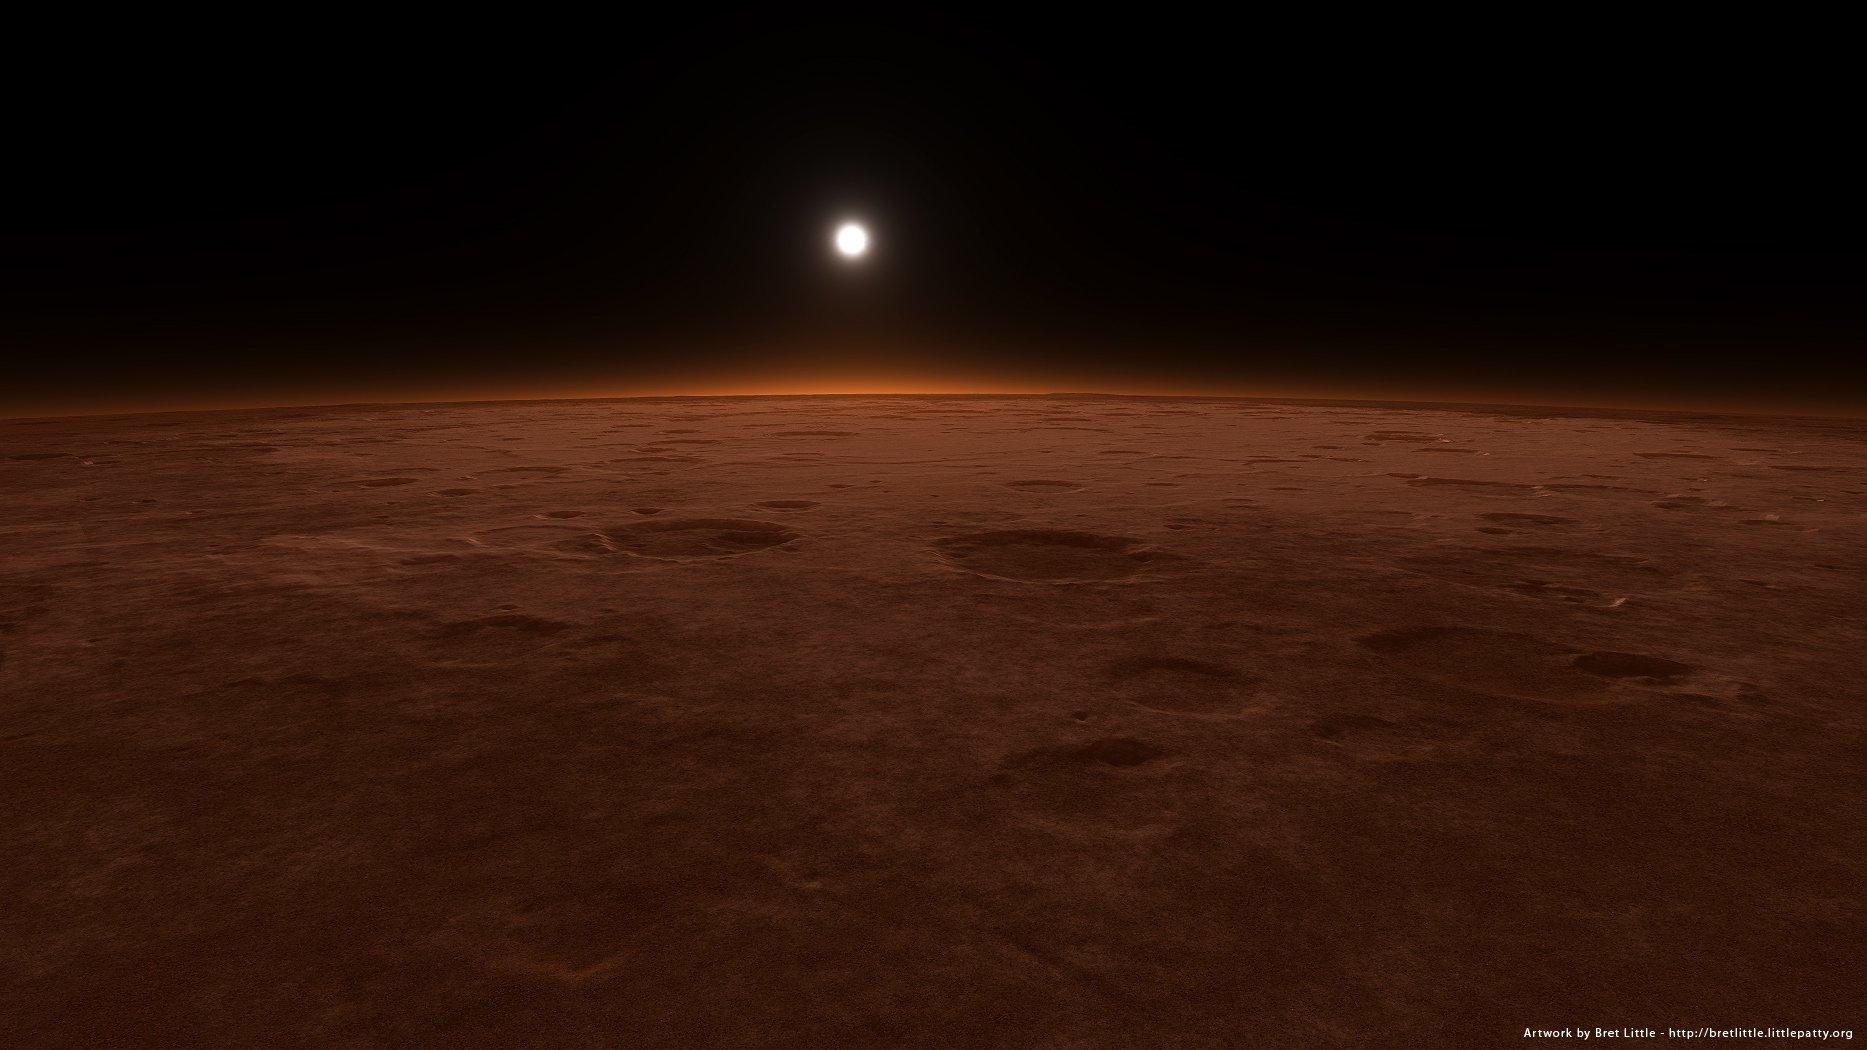 Mars surface wallpaper - Space wallpapers - Free wallpapers, Desktop ...